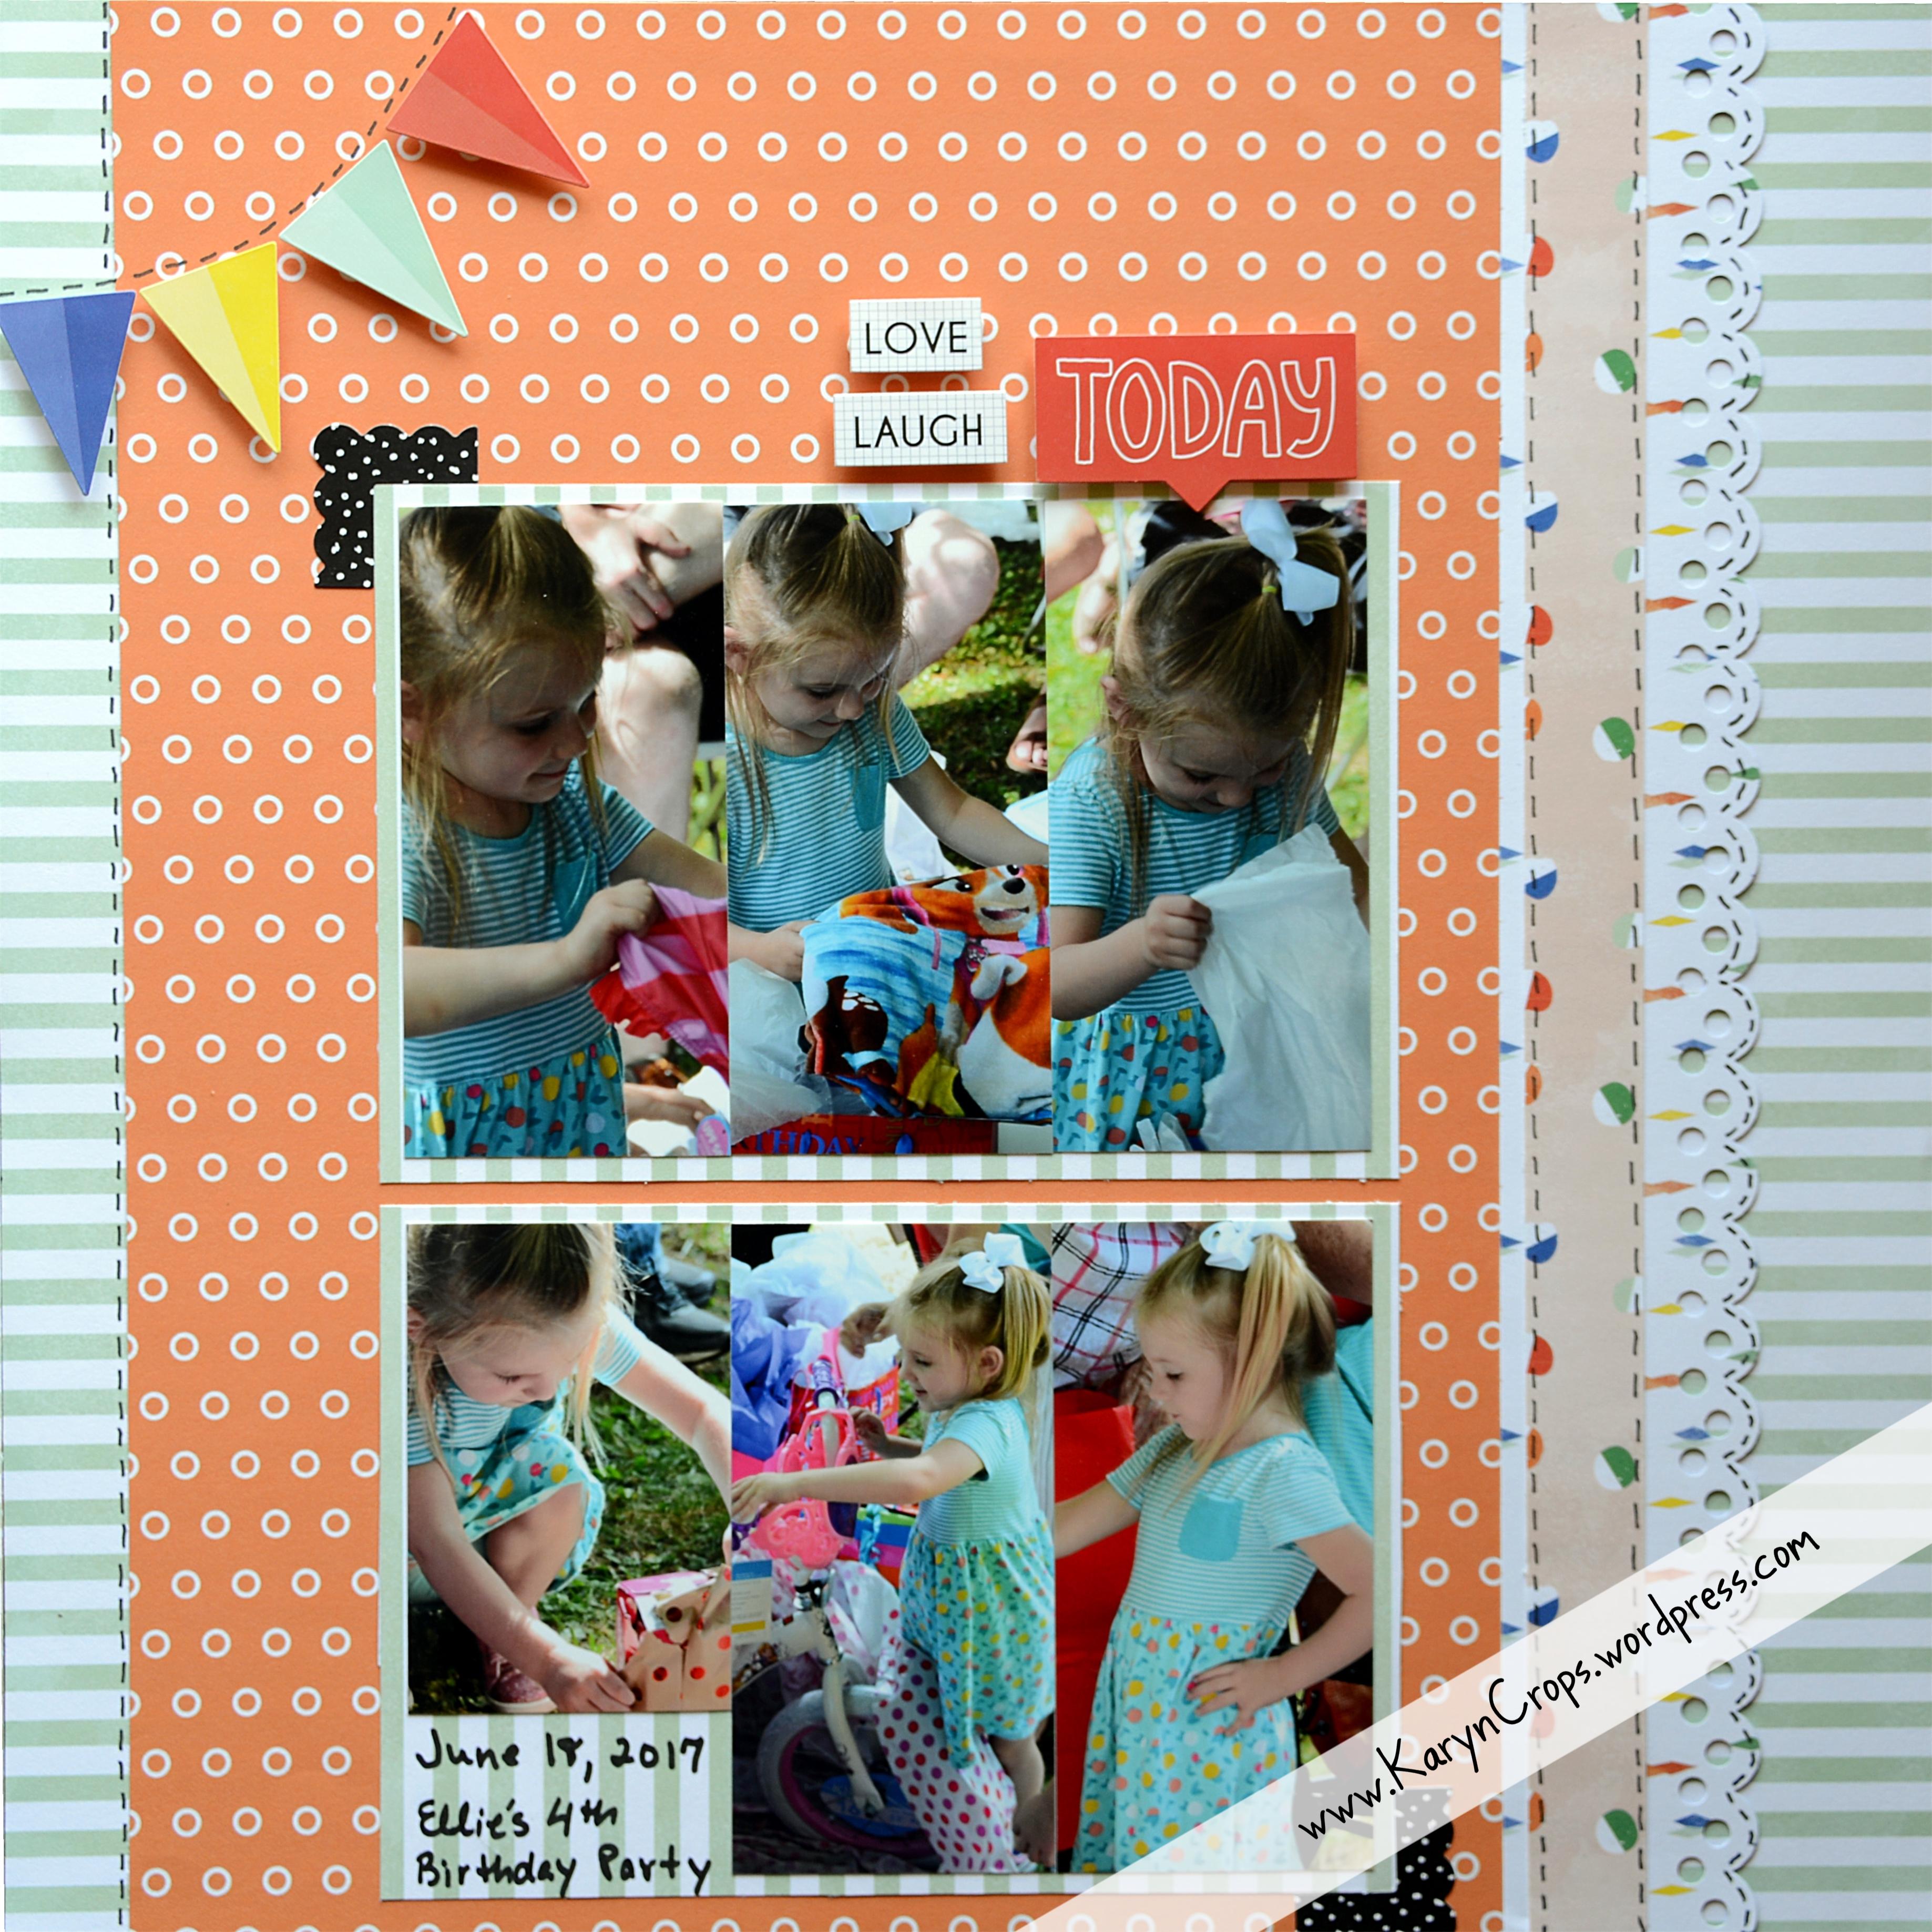 KarynCropsWordpressNSDLayouts2 - Page 081